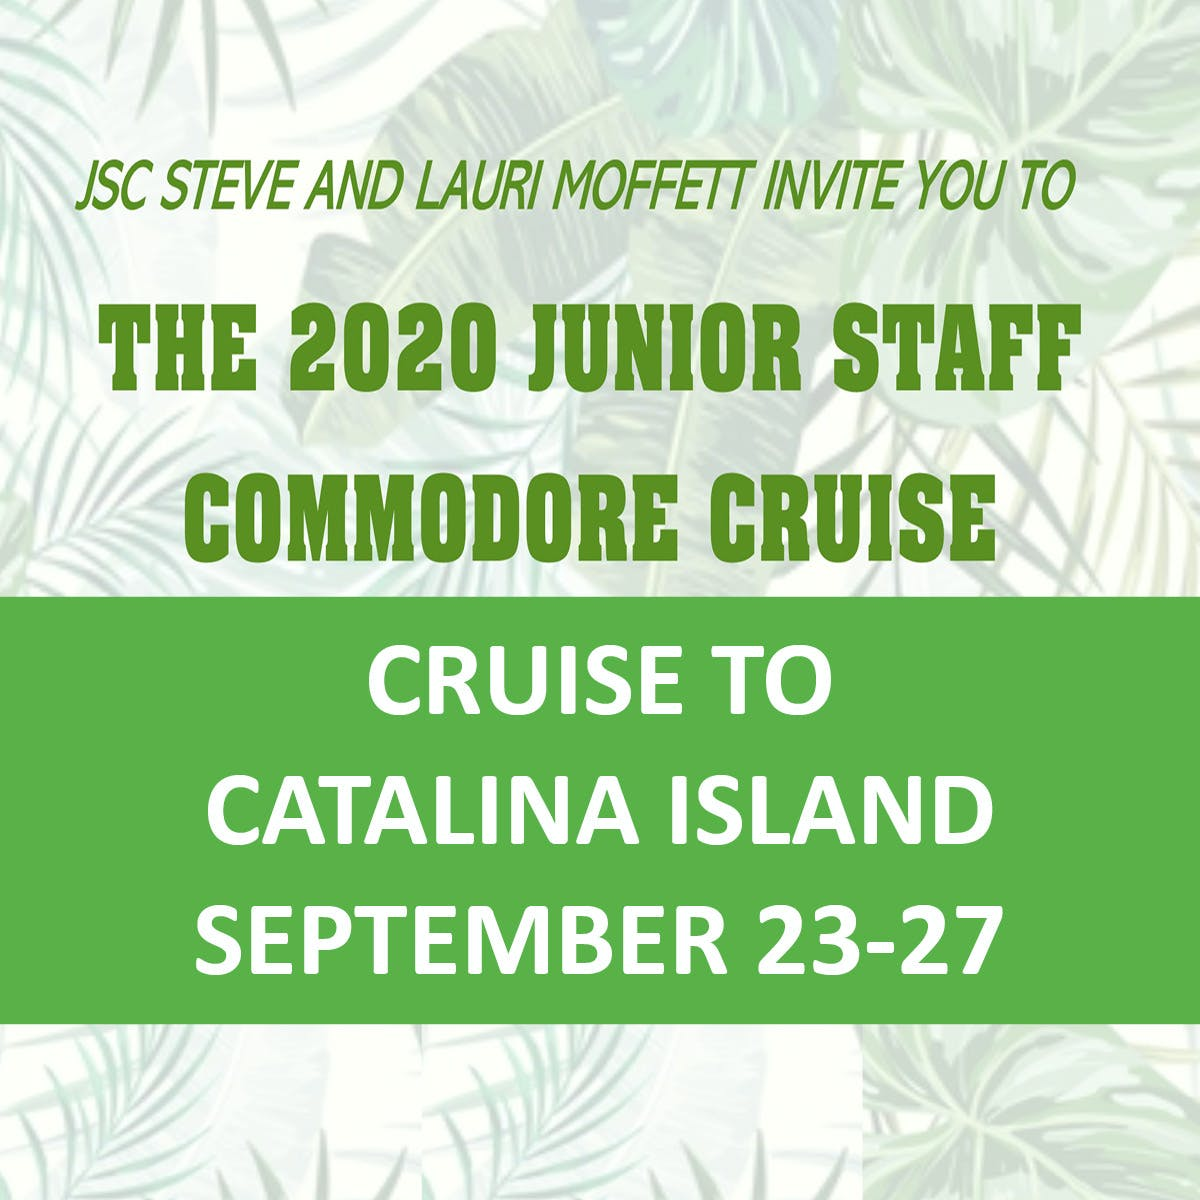 JSC Cruise to Catalina